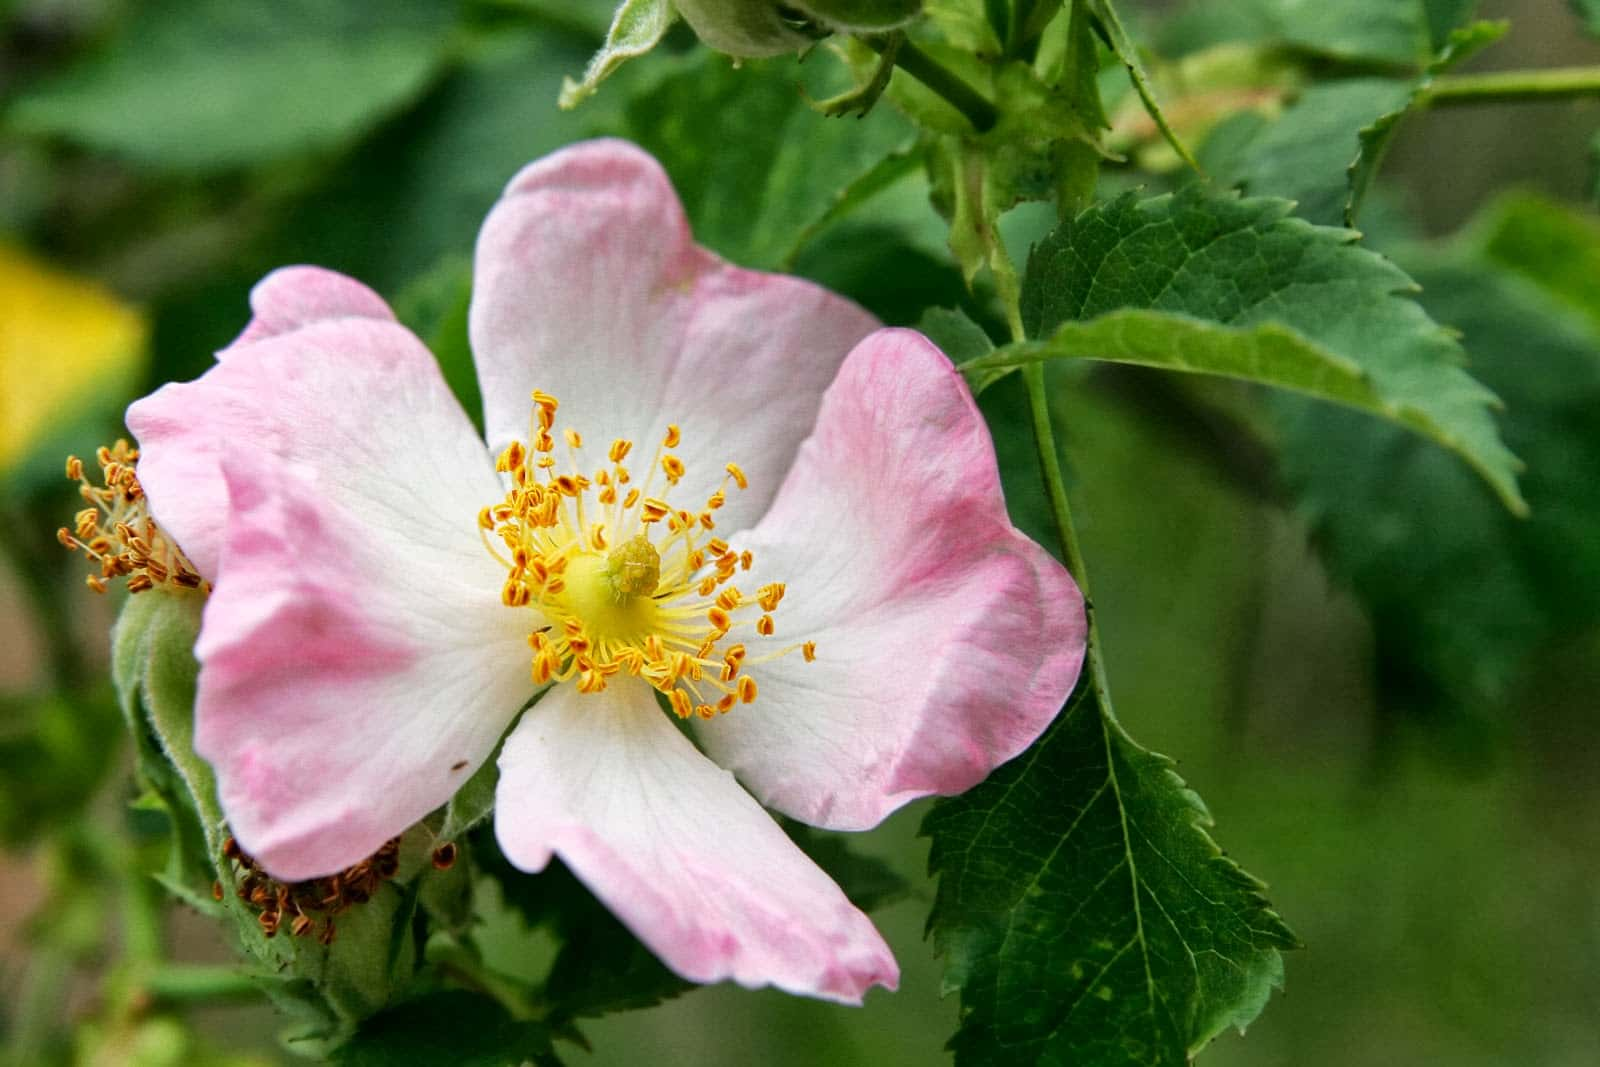 rimedi naturali rosa canina